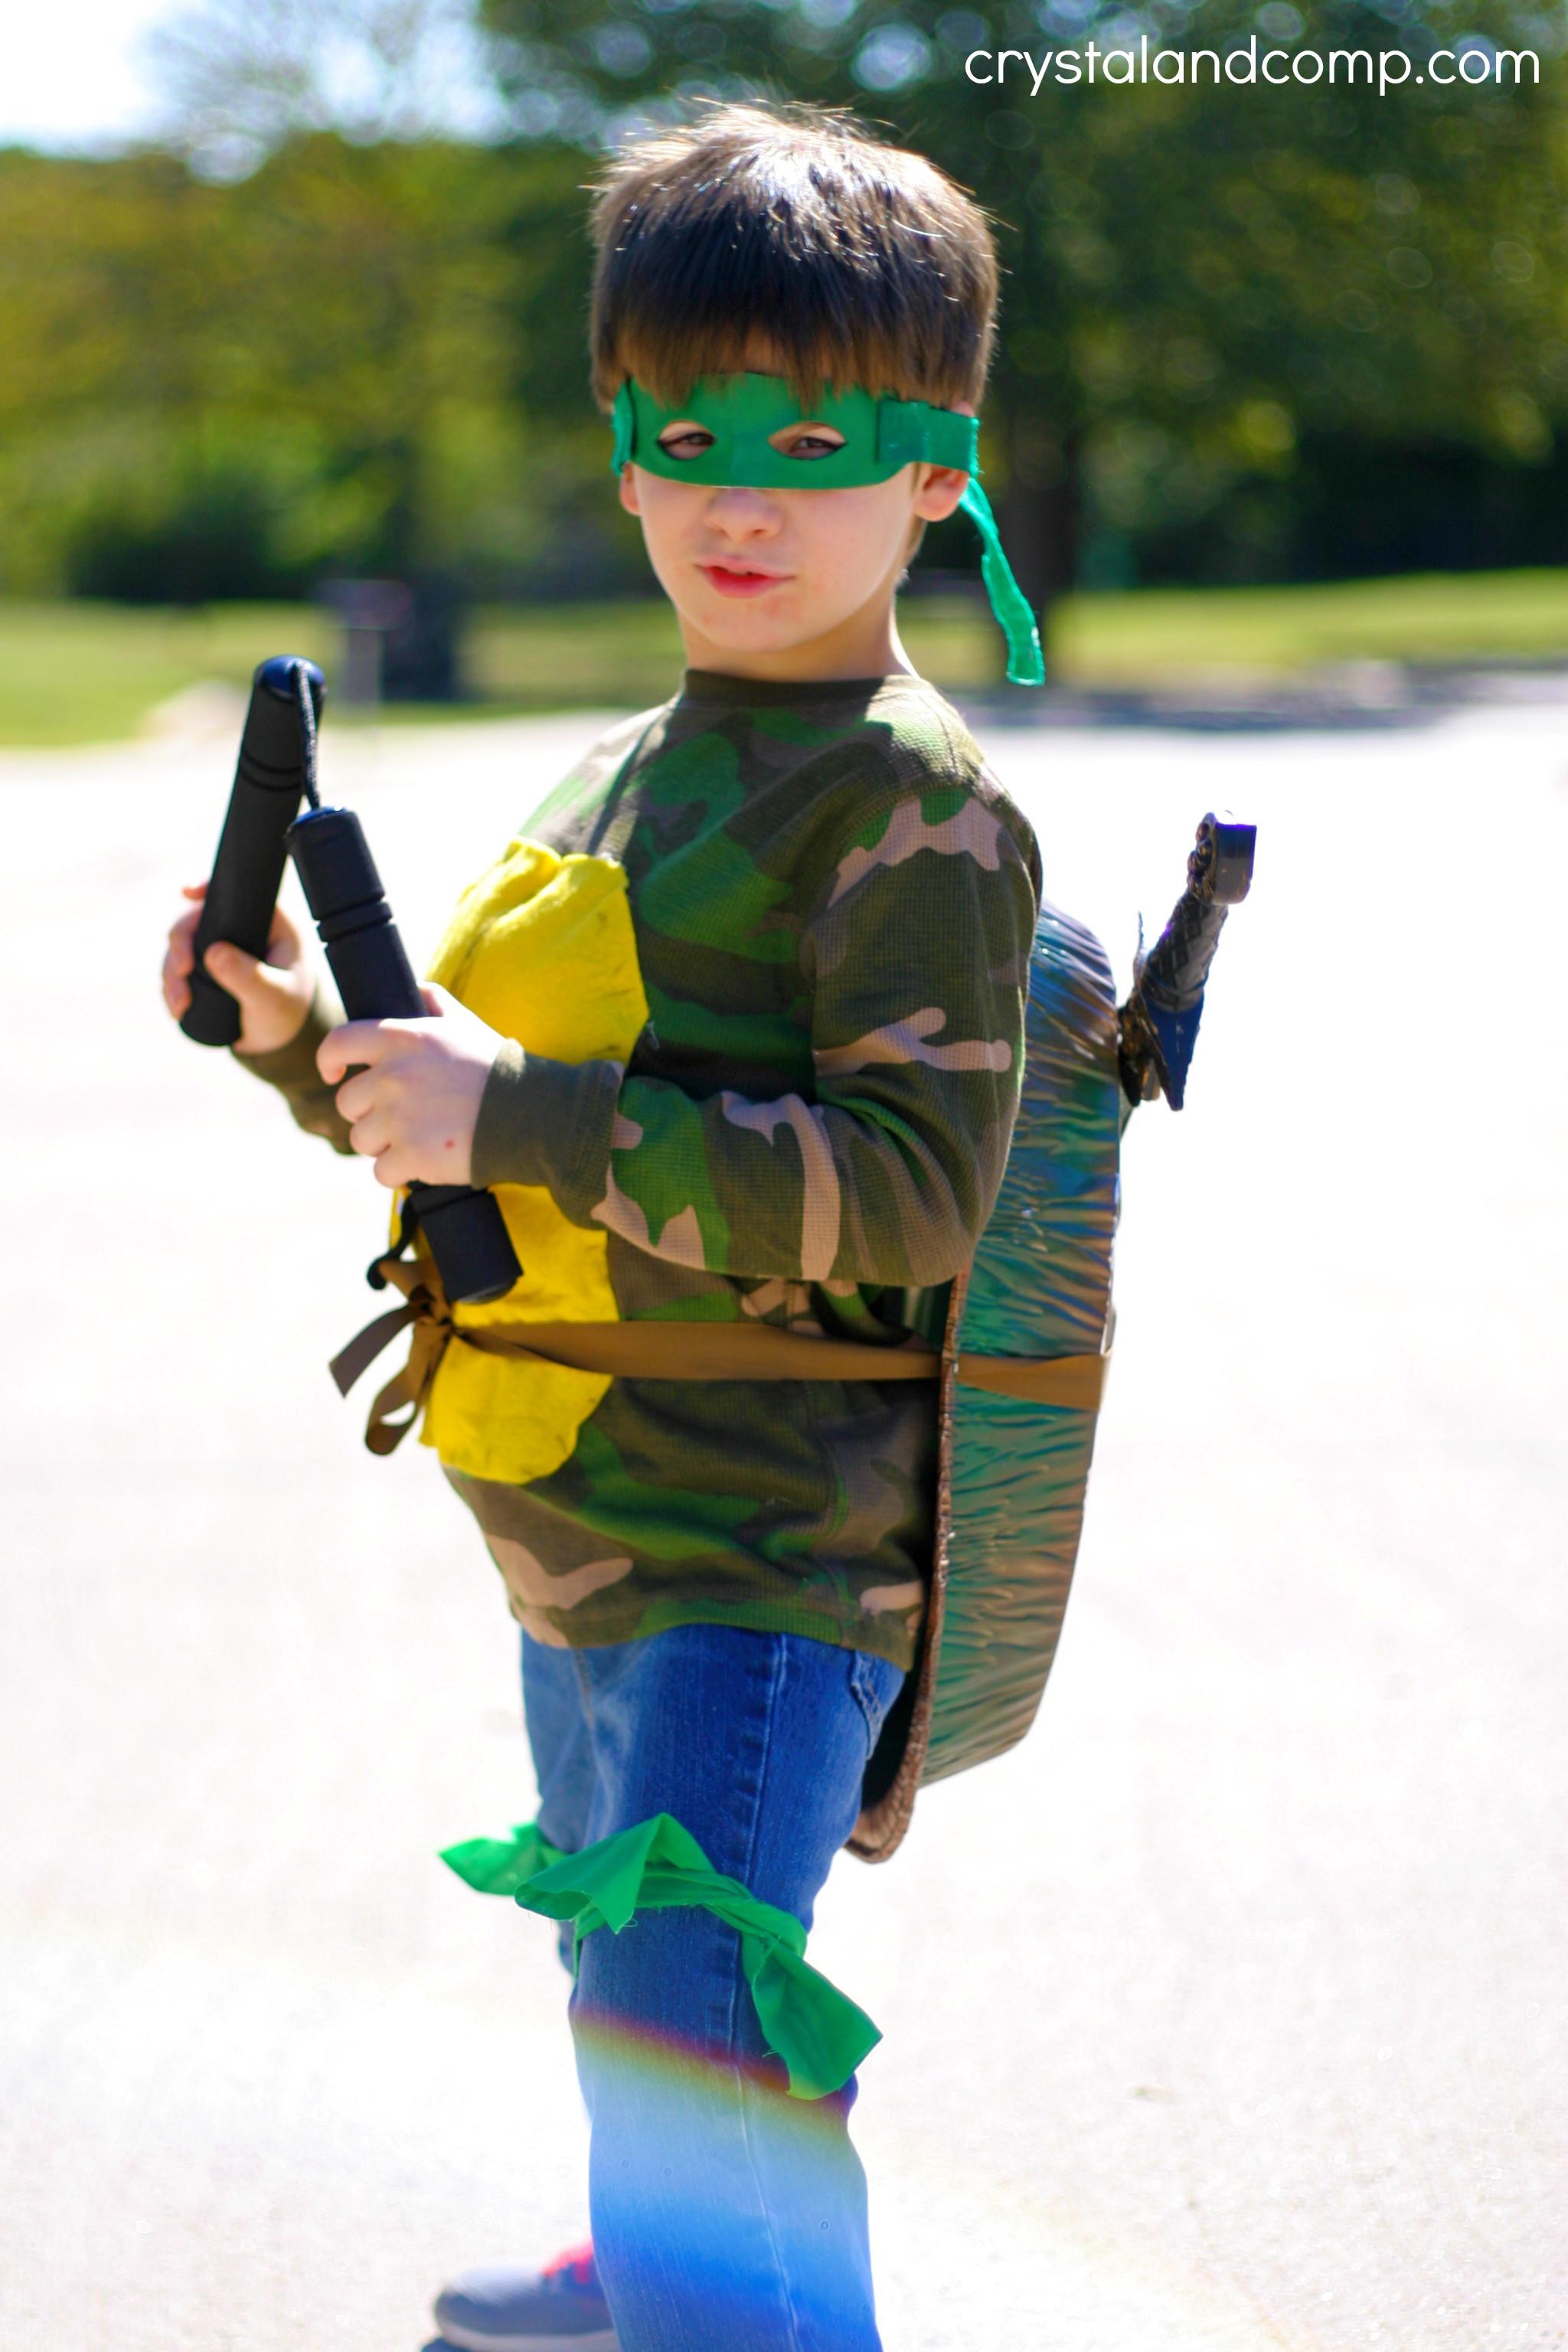 Best ideas about DIY Ninja Turtle Costume . Save or Pin DIY Ninja Turtle Costume Now.